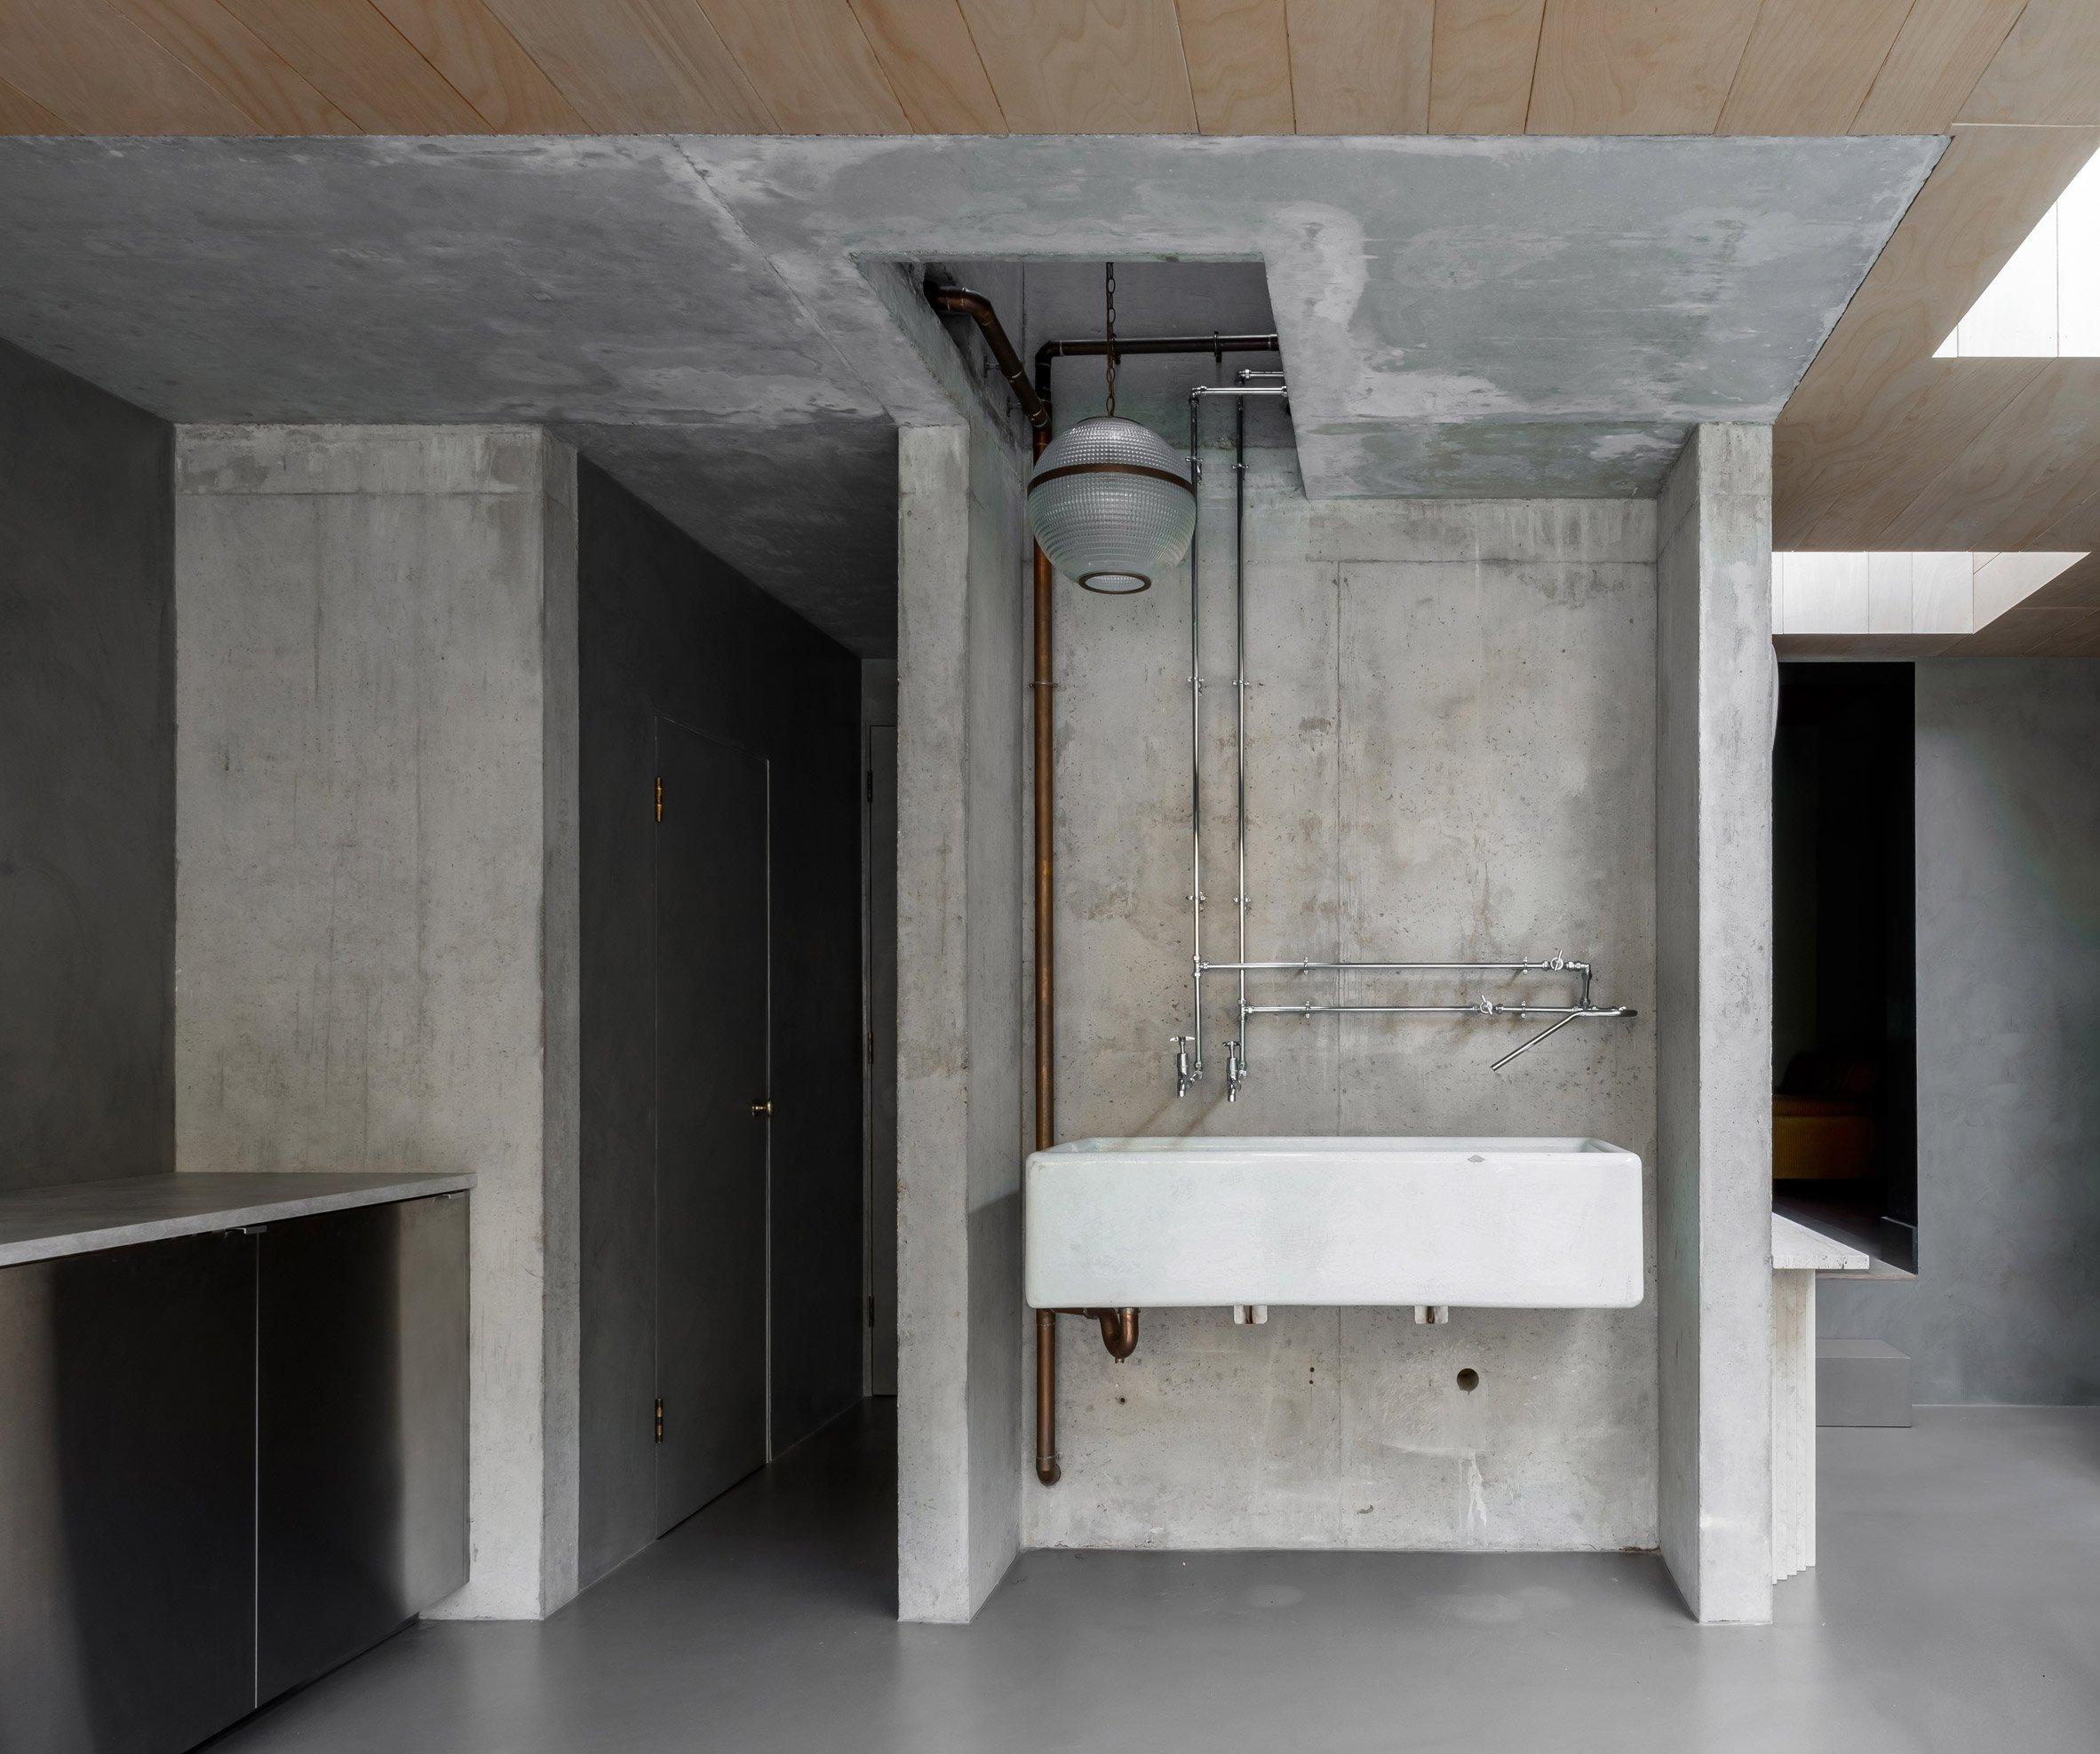 Kitchen sink of Untiled House extension by Szczepaniak Astridge in London